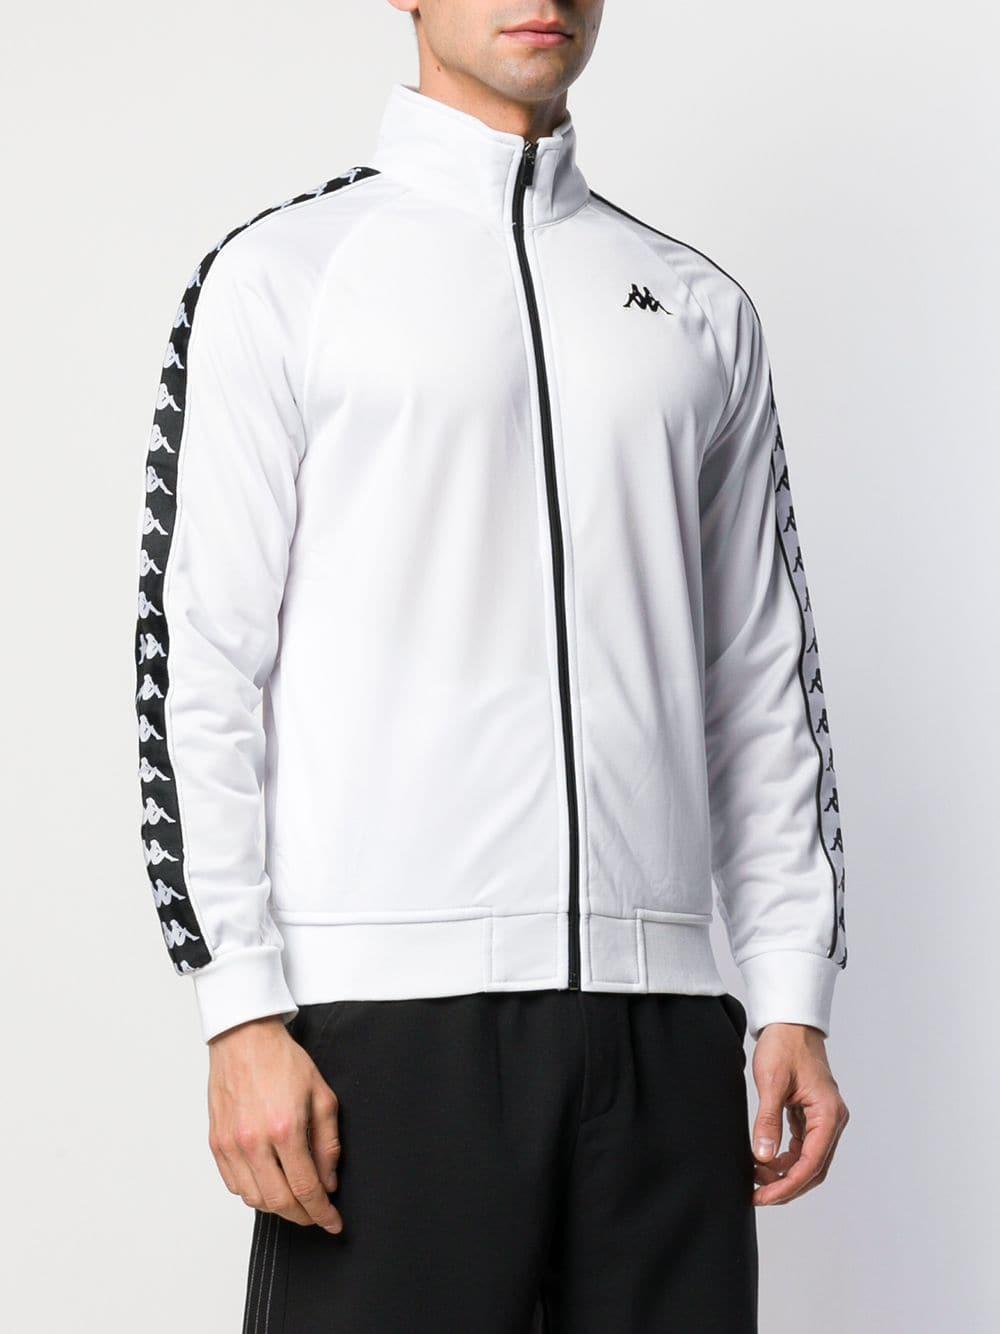 122c7246 Kappa Logo Tape Sport Jacket in White for Men - Lyst